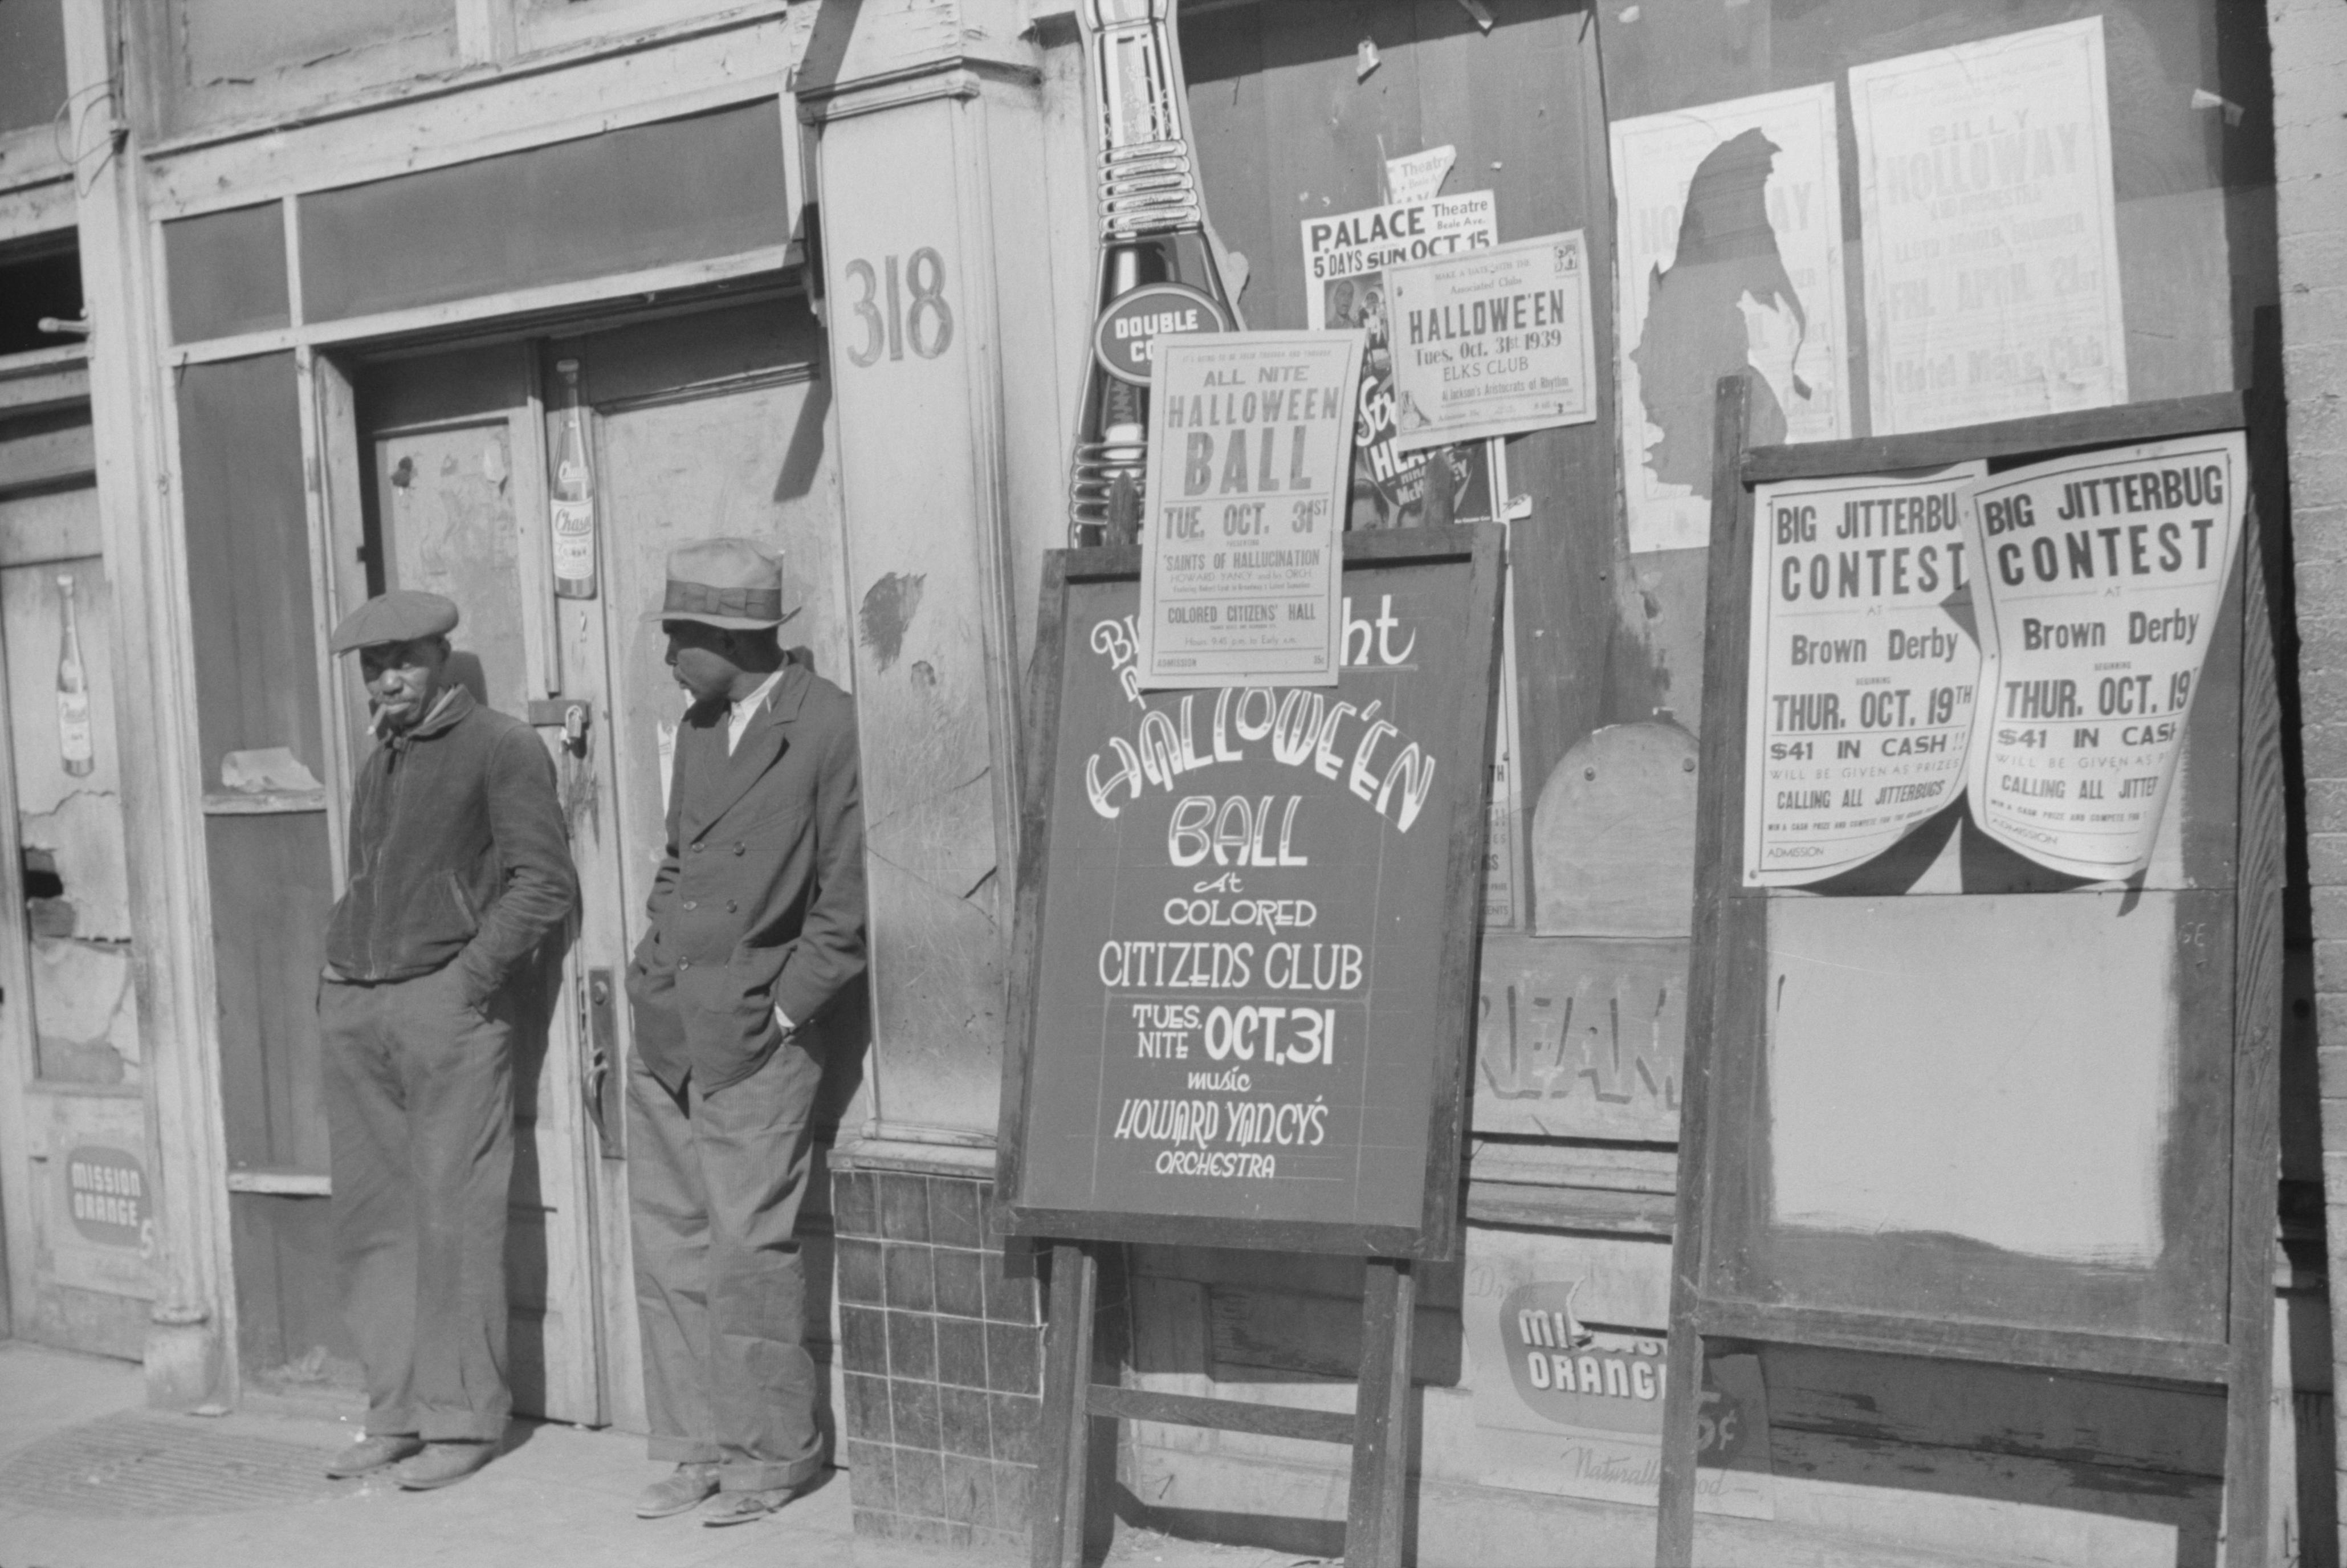 Memphis Halloween Beale 2020 File:Memphis, Tennessee, Beale Street, October 1939. (3110571760